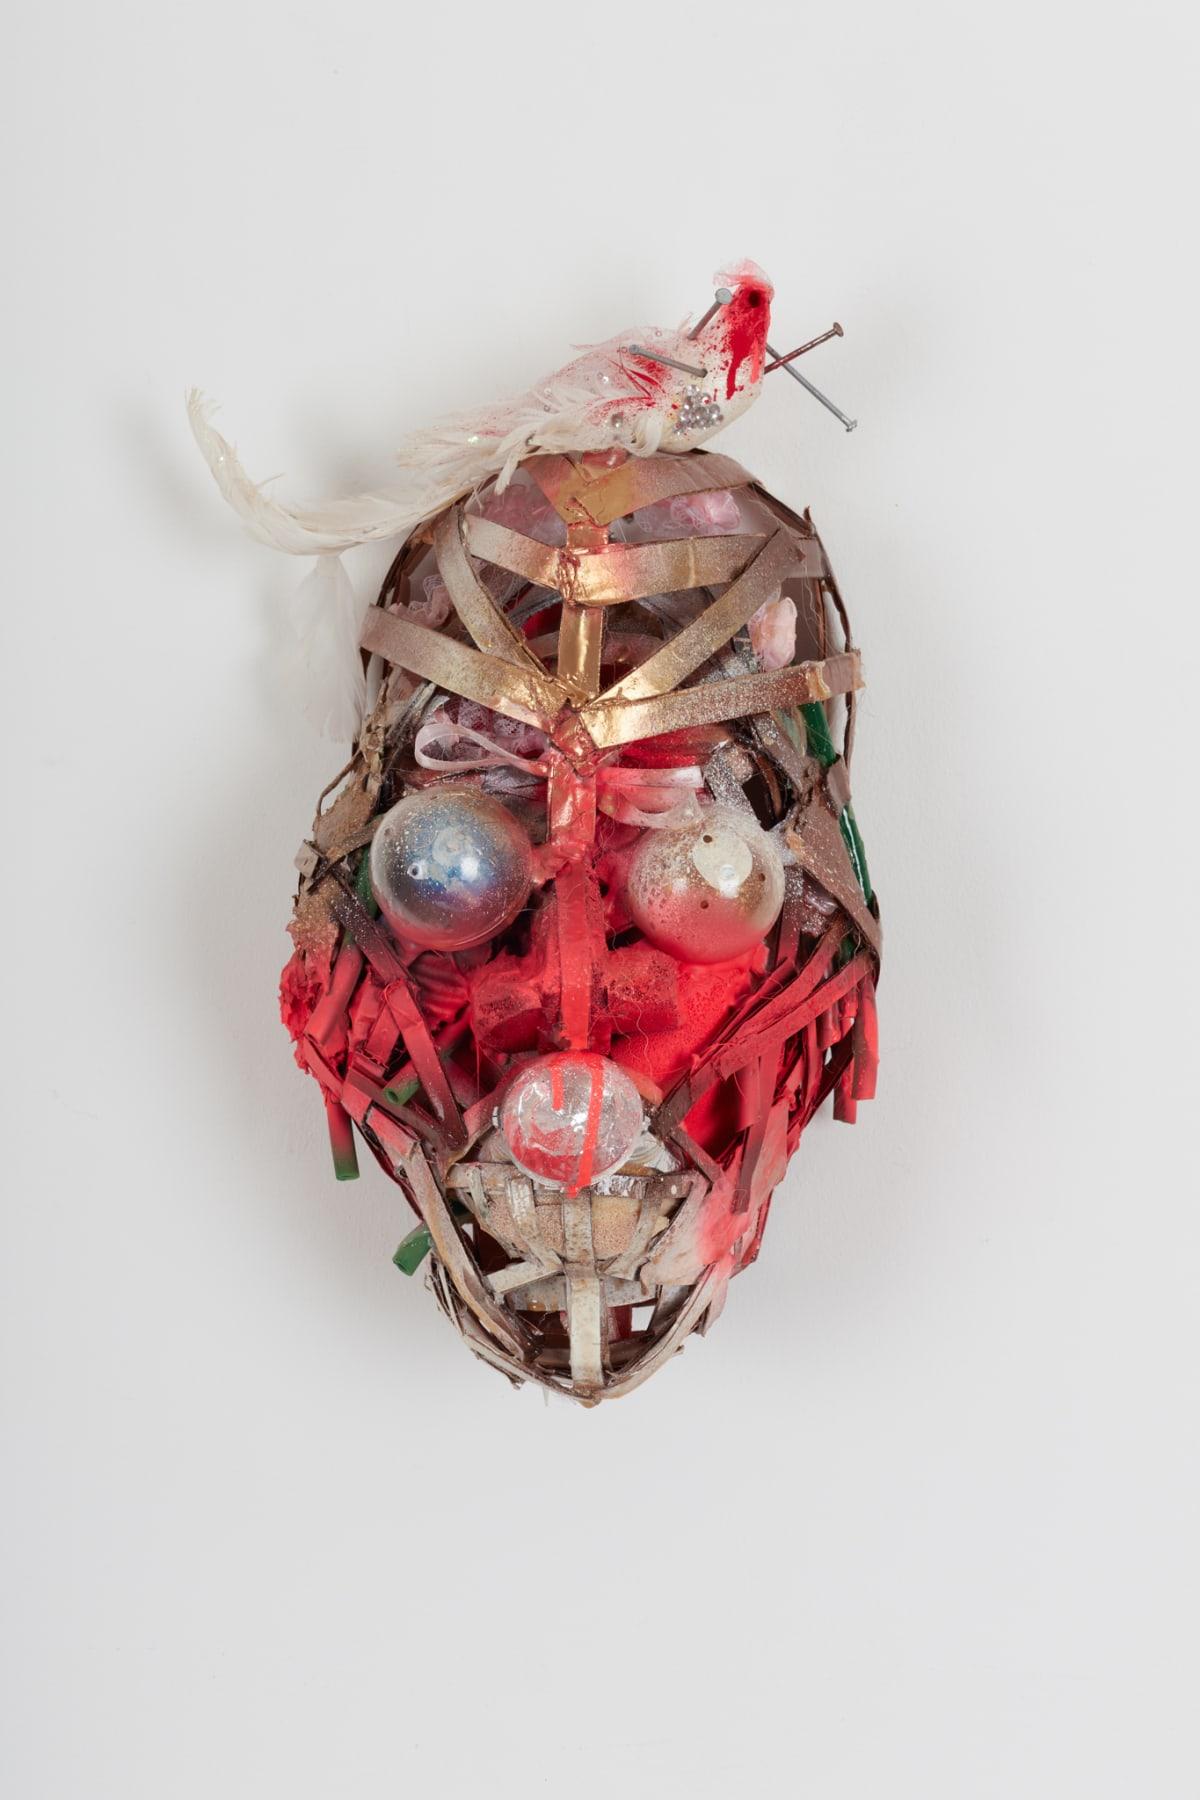 Lavar Munroe, Small Solider War Mask : War General, 2018